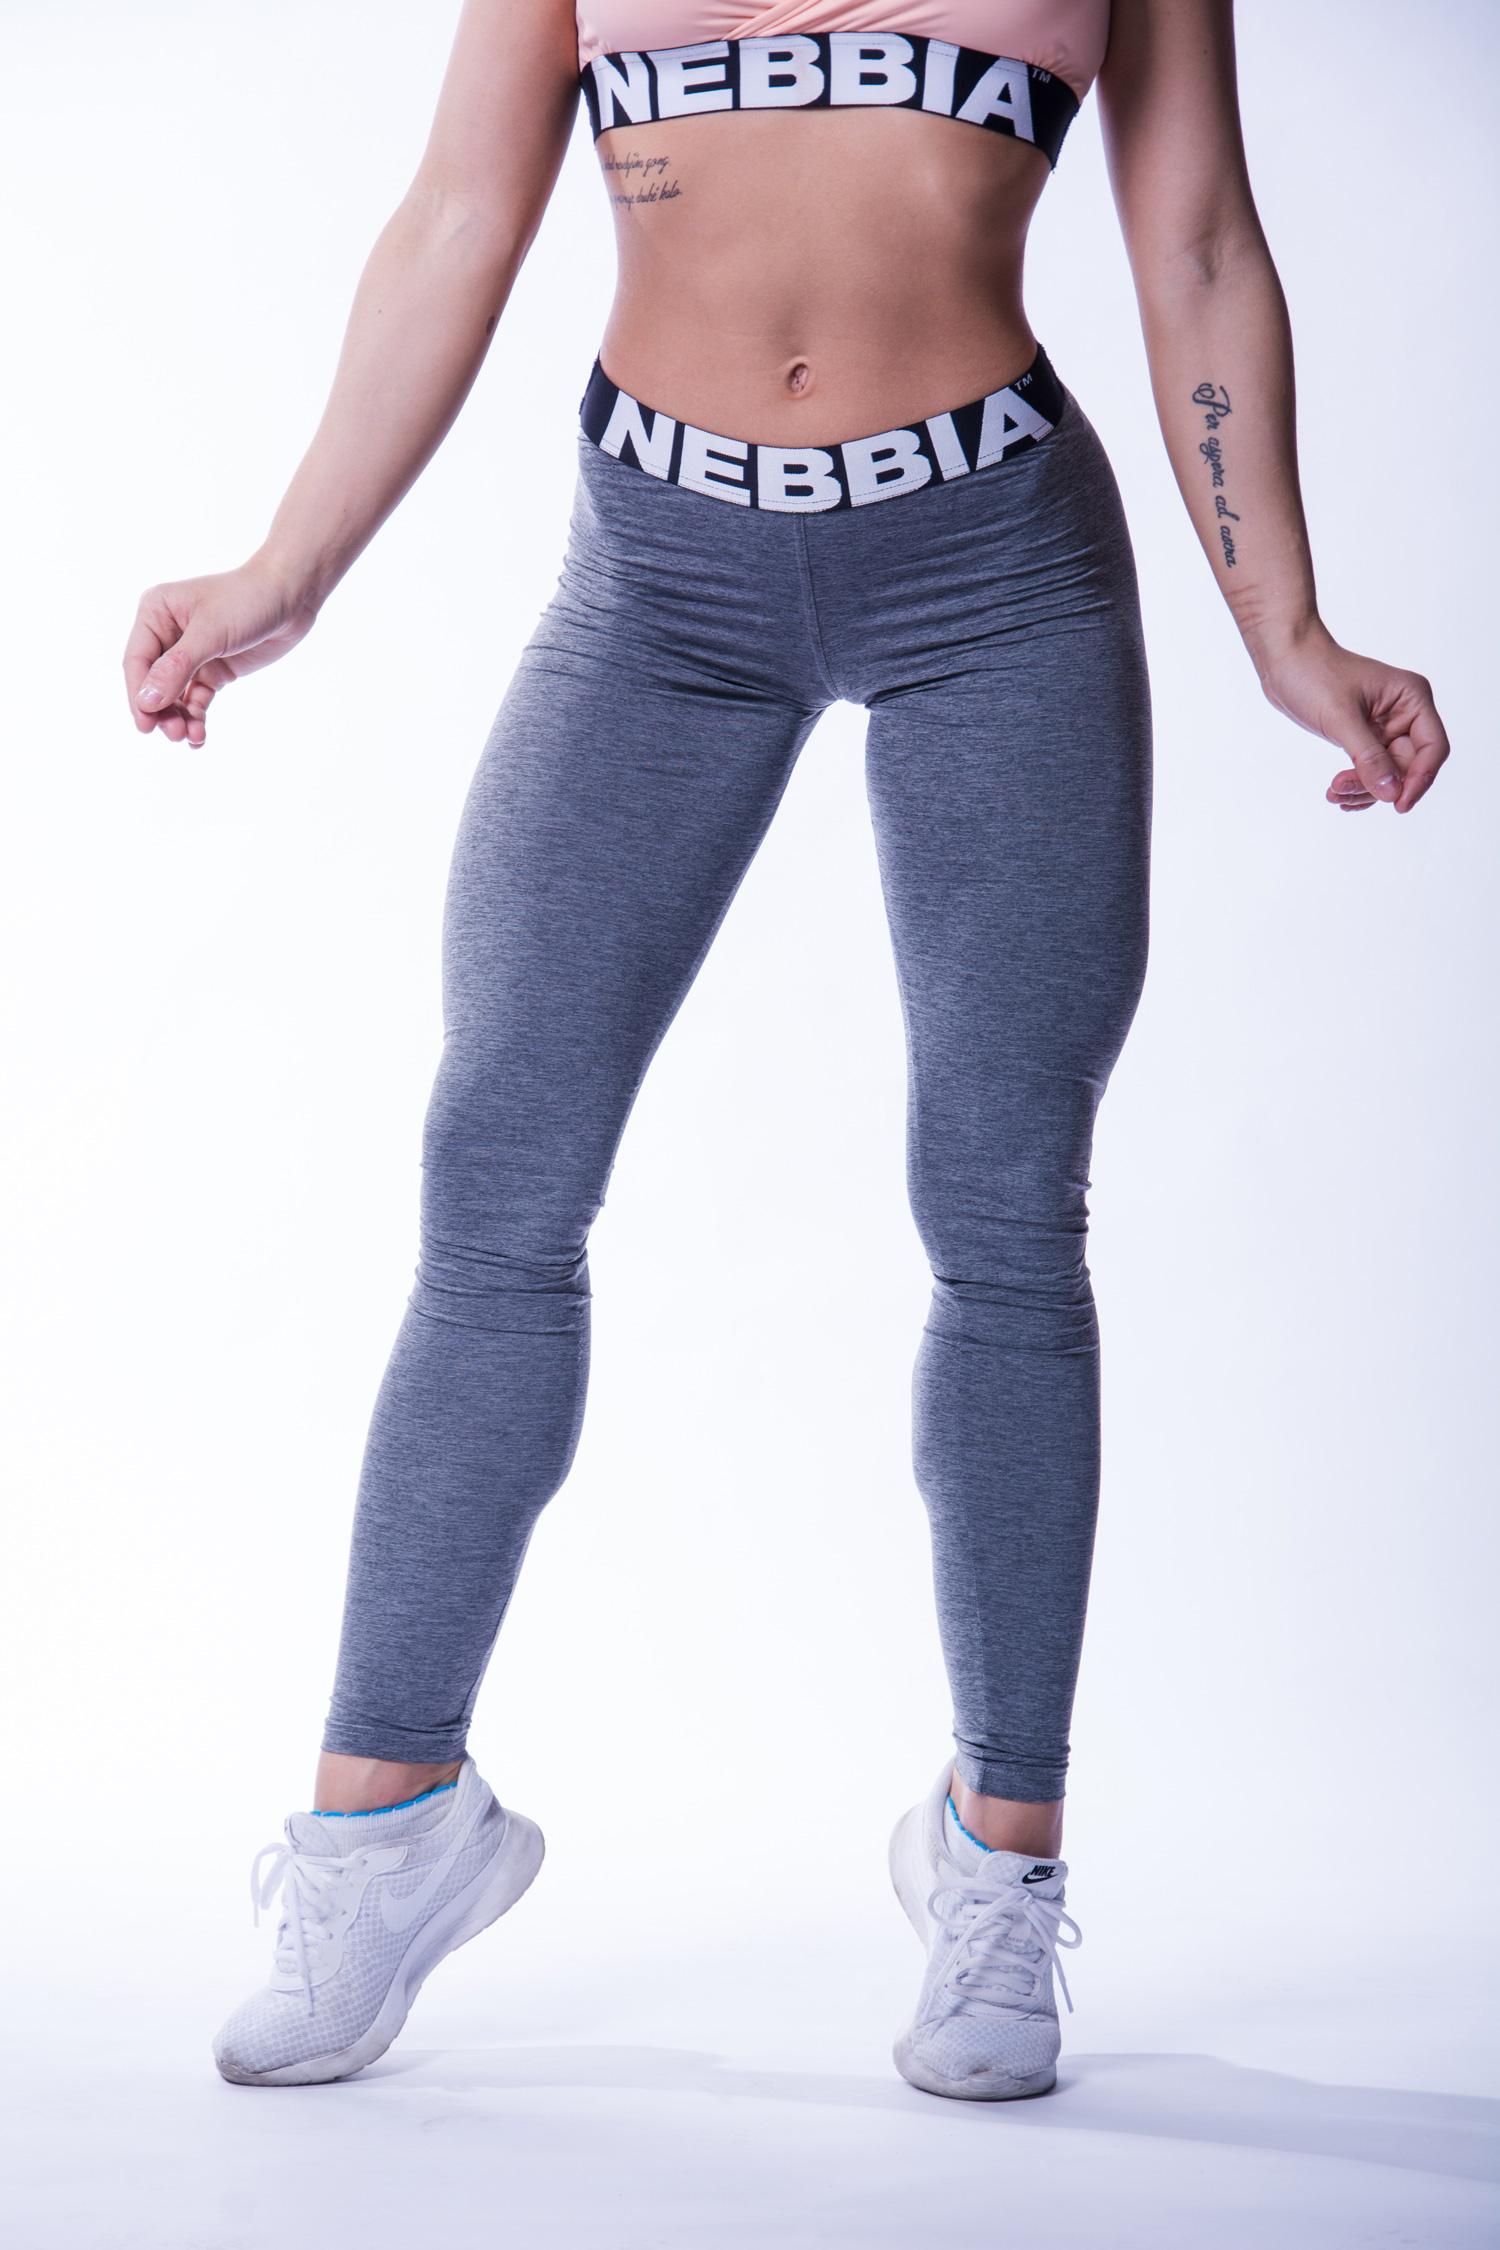 nebbia-222-legging-grijs-1